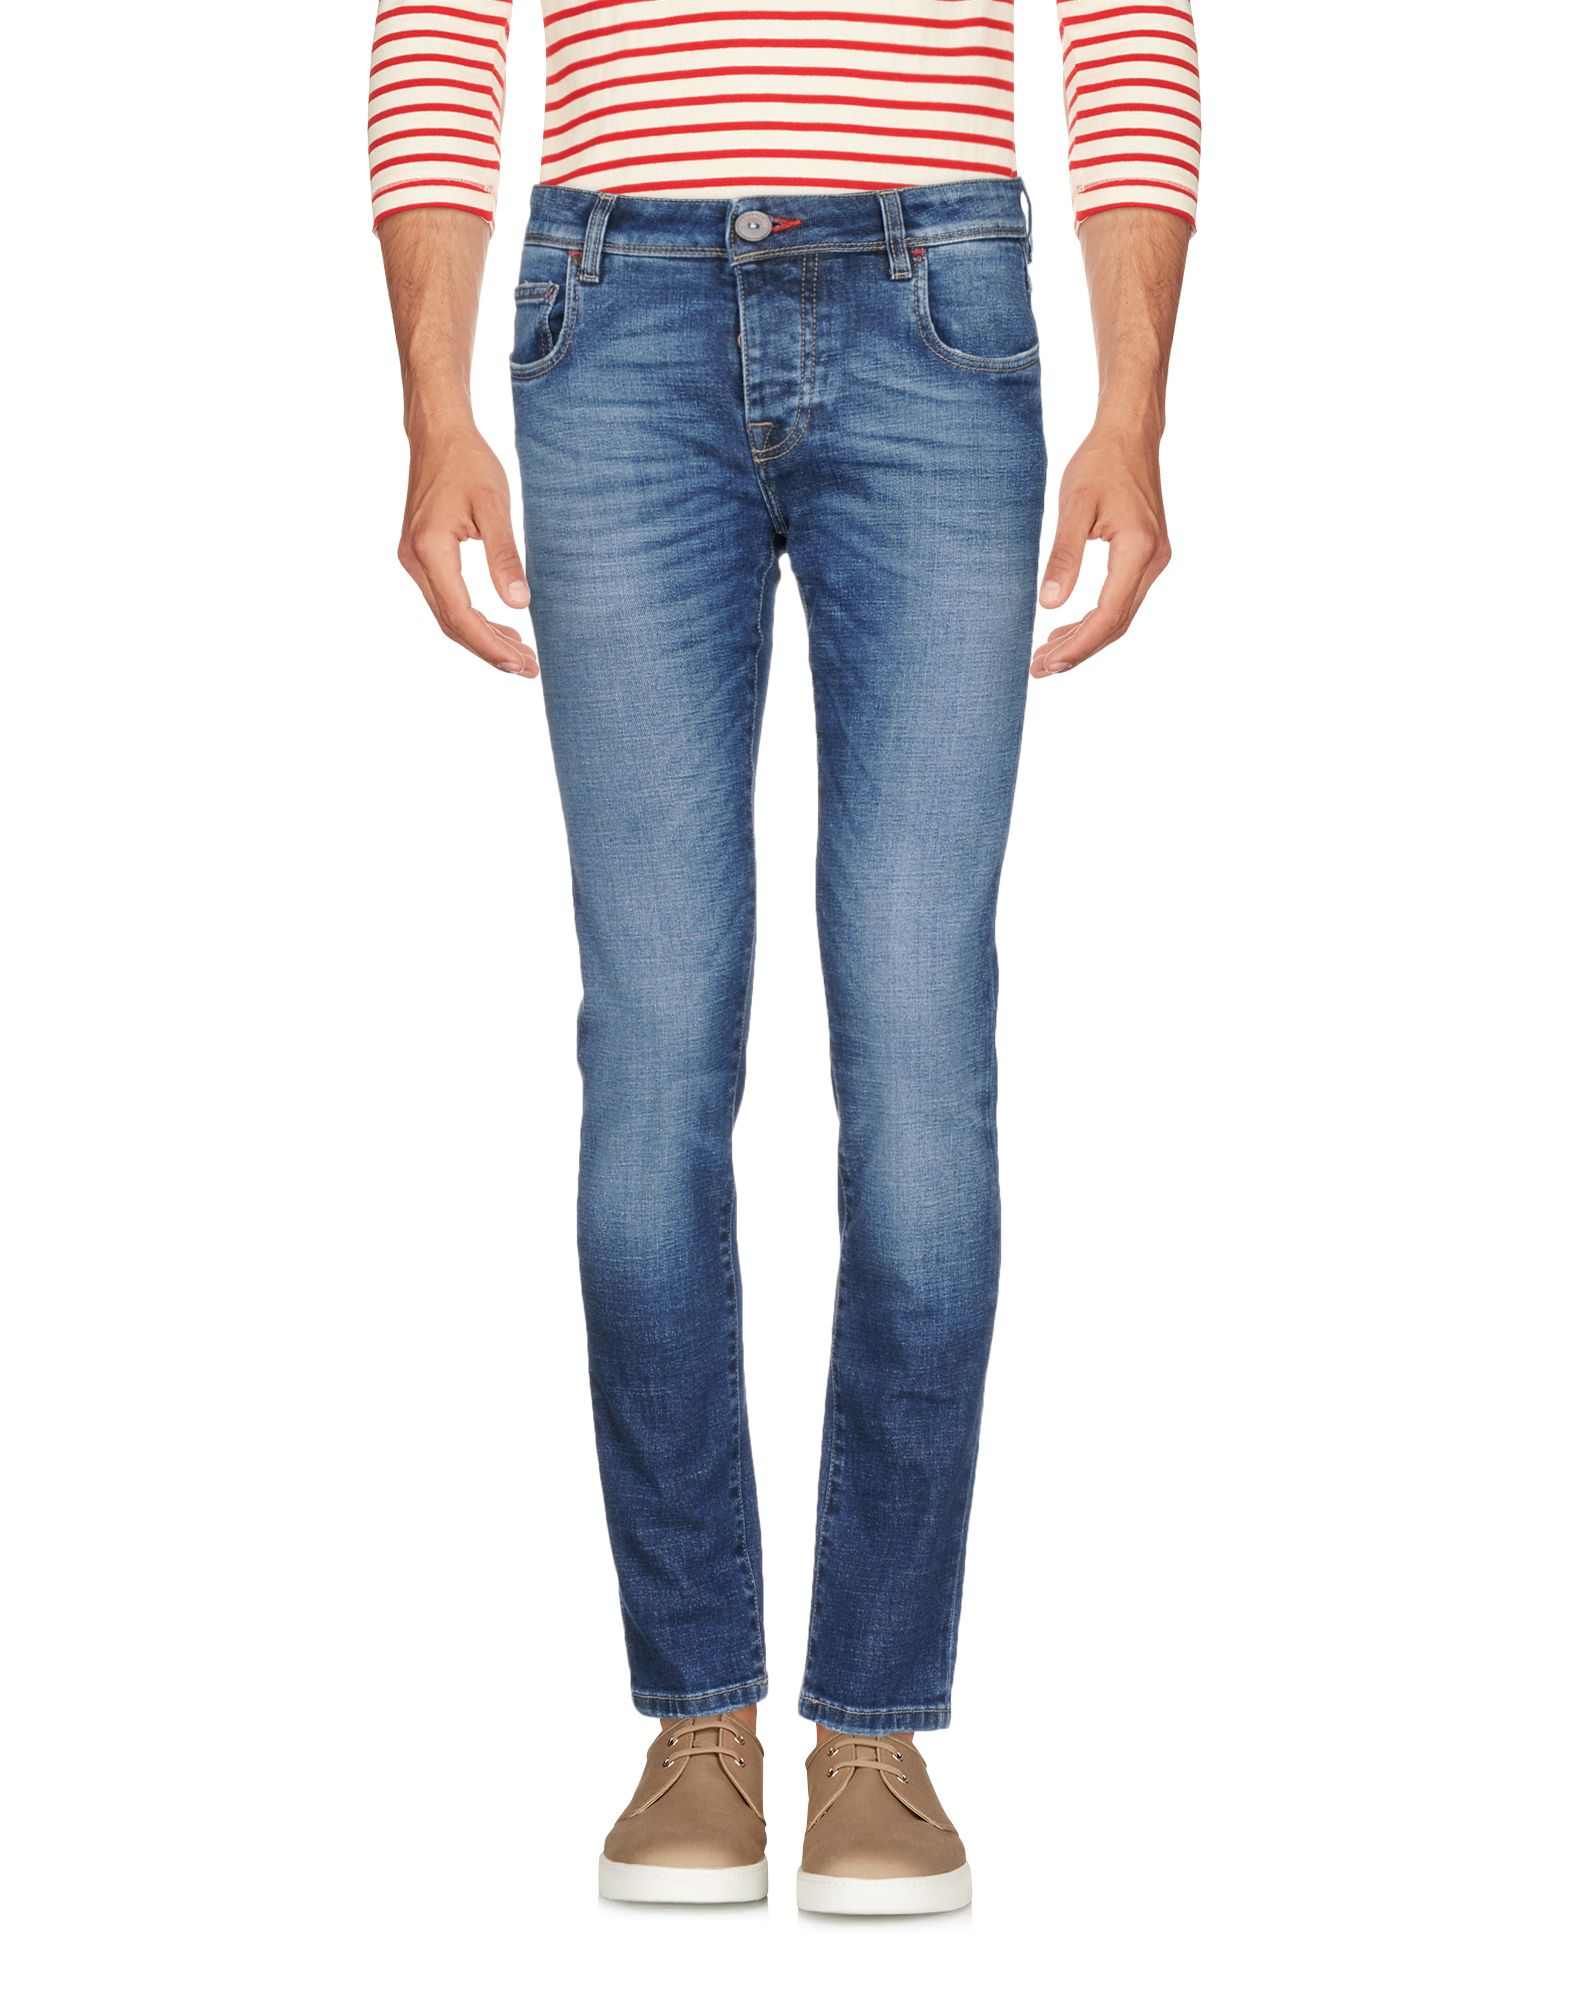 Pantaloni Jeans Camouflage Ar And J. Uomo - Acquista online su